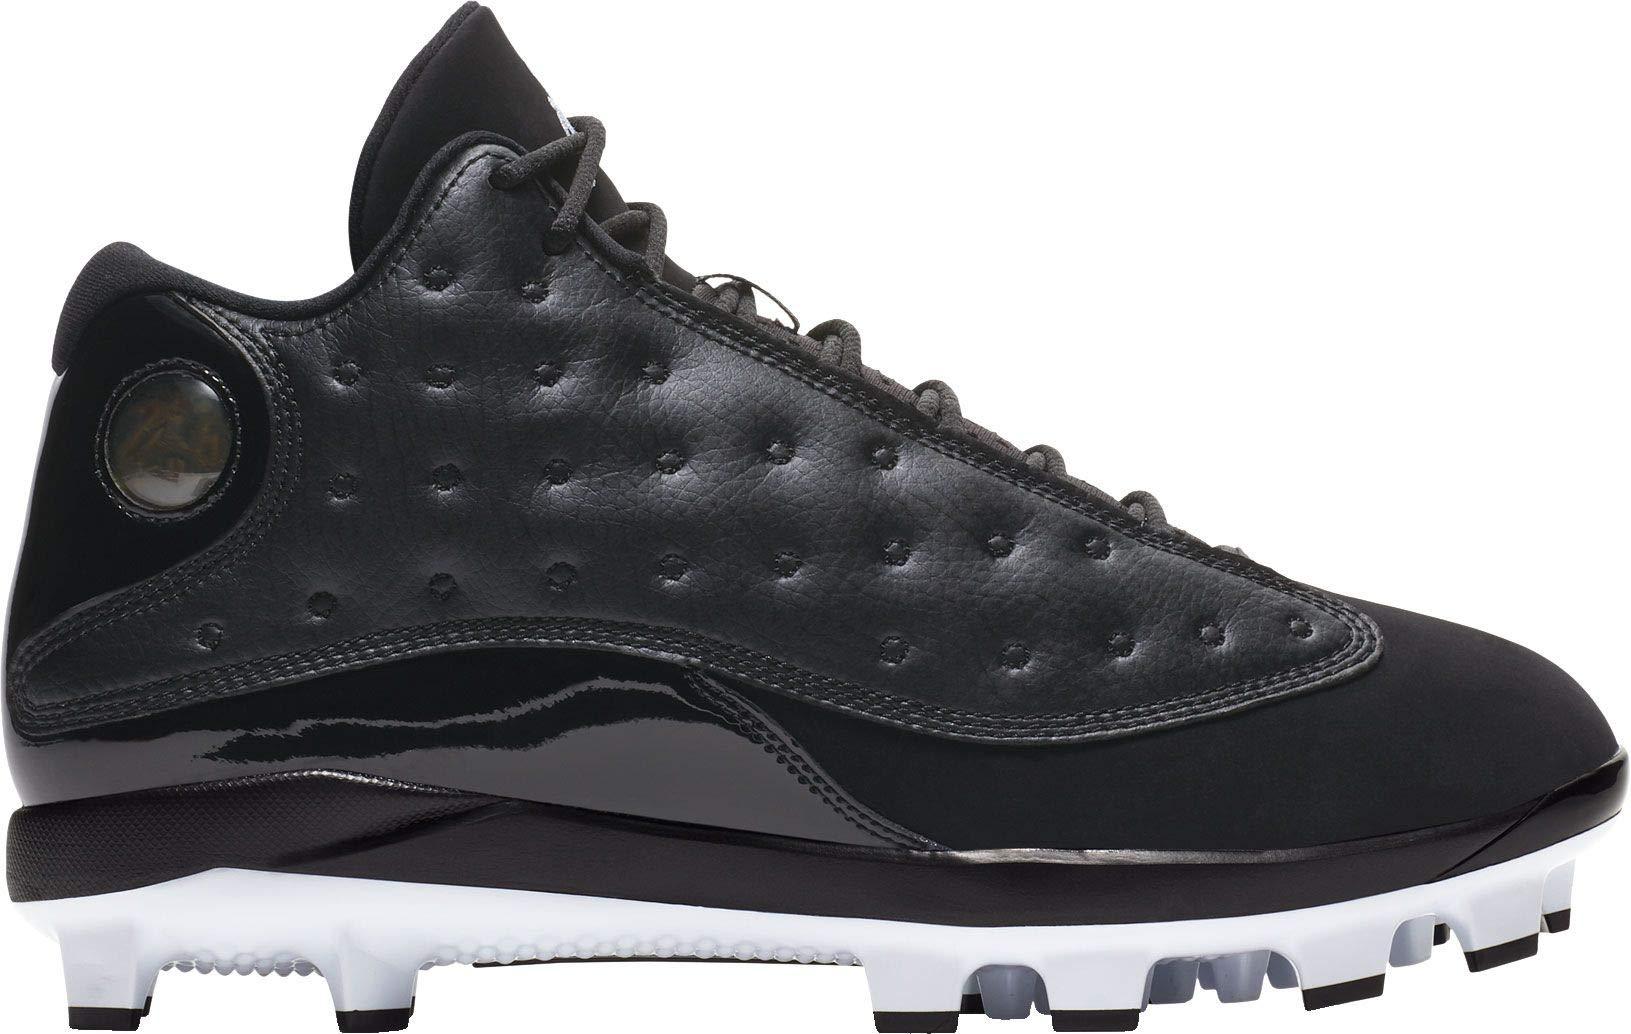 001989d231d ... 7 Retro Metal Baseball Cleats Black 684943-010.  54.99. Jordan Men s  Baseball Cleat Air XIII Retro MCS (11